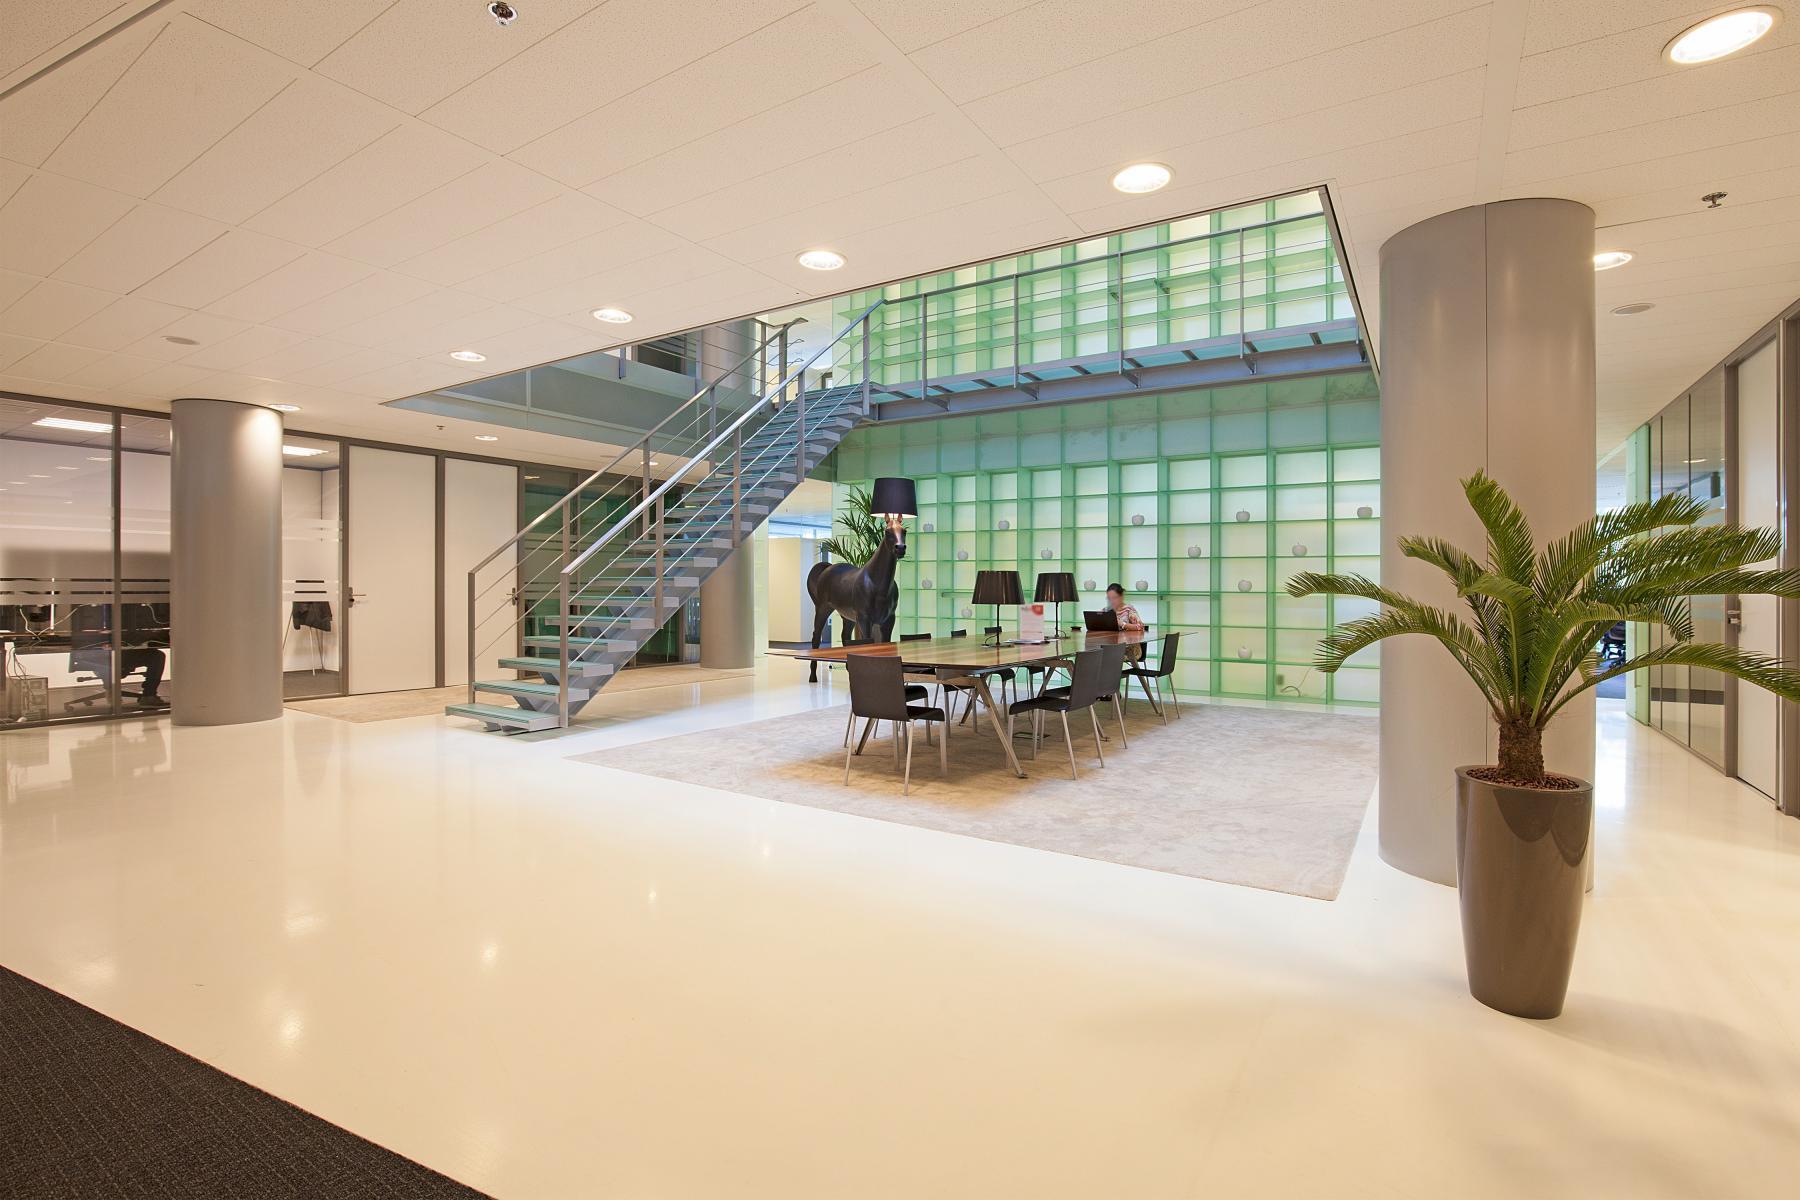 sociaalhart meubilair kantoorruimte kantoorgebouw